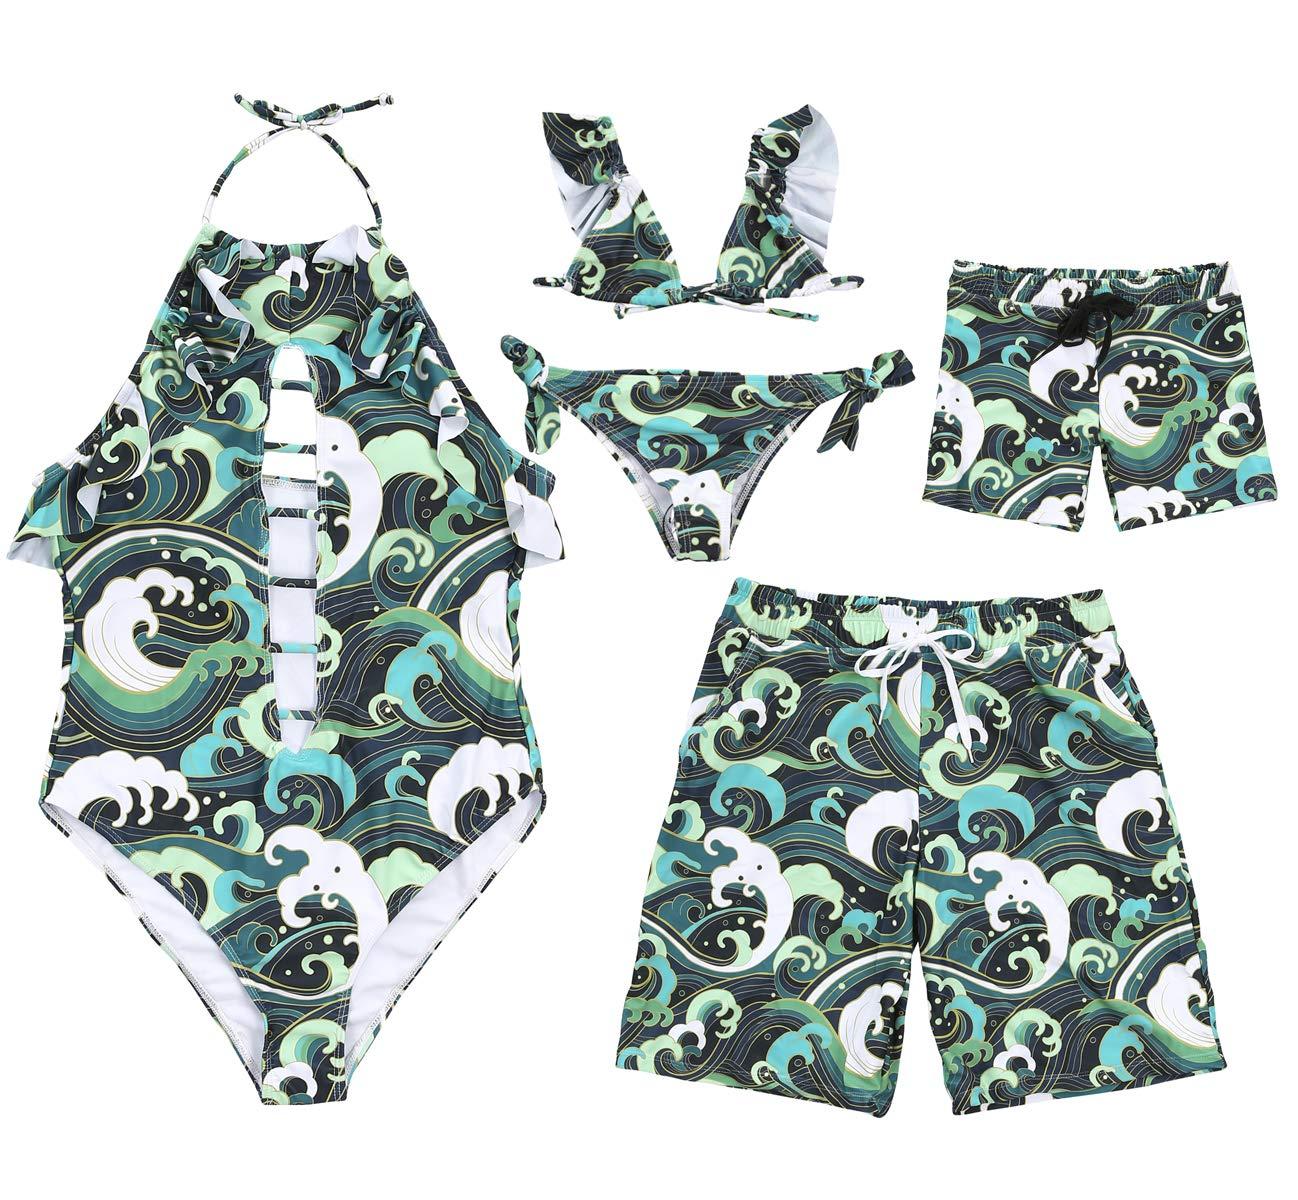 Family Matching Sea Wave Print Green Beachwear Mommy&Me Halter Neck V-Neck Monokini Bikinis Daddy&Me Swim Shorts (Boy, Boy 5T)